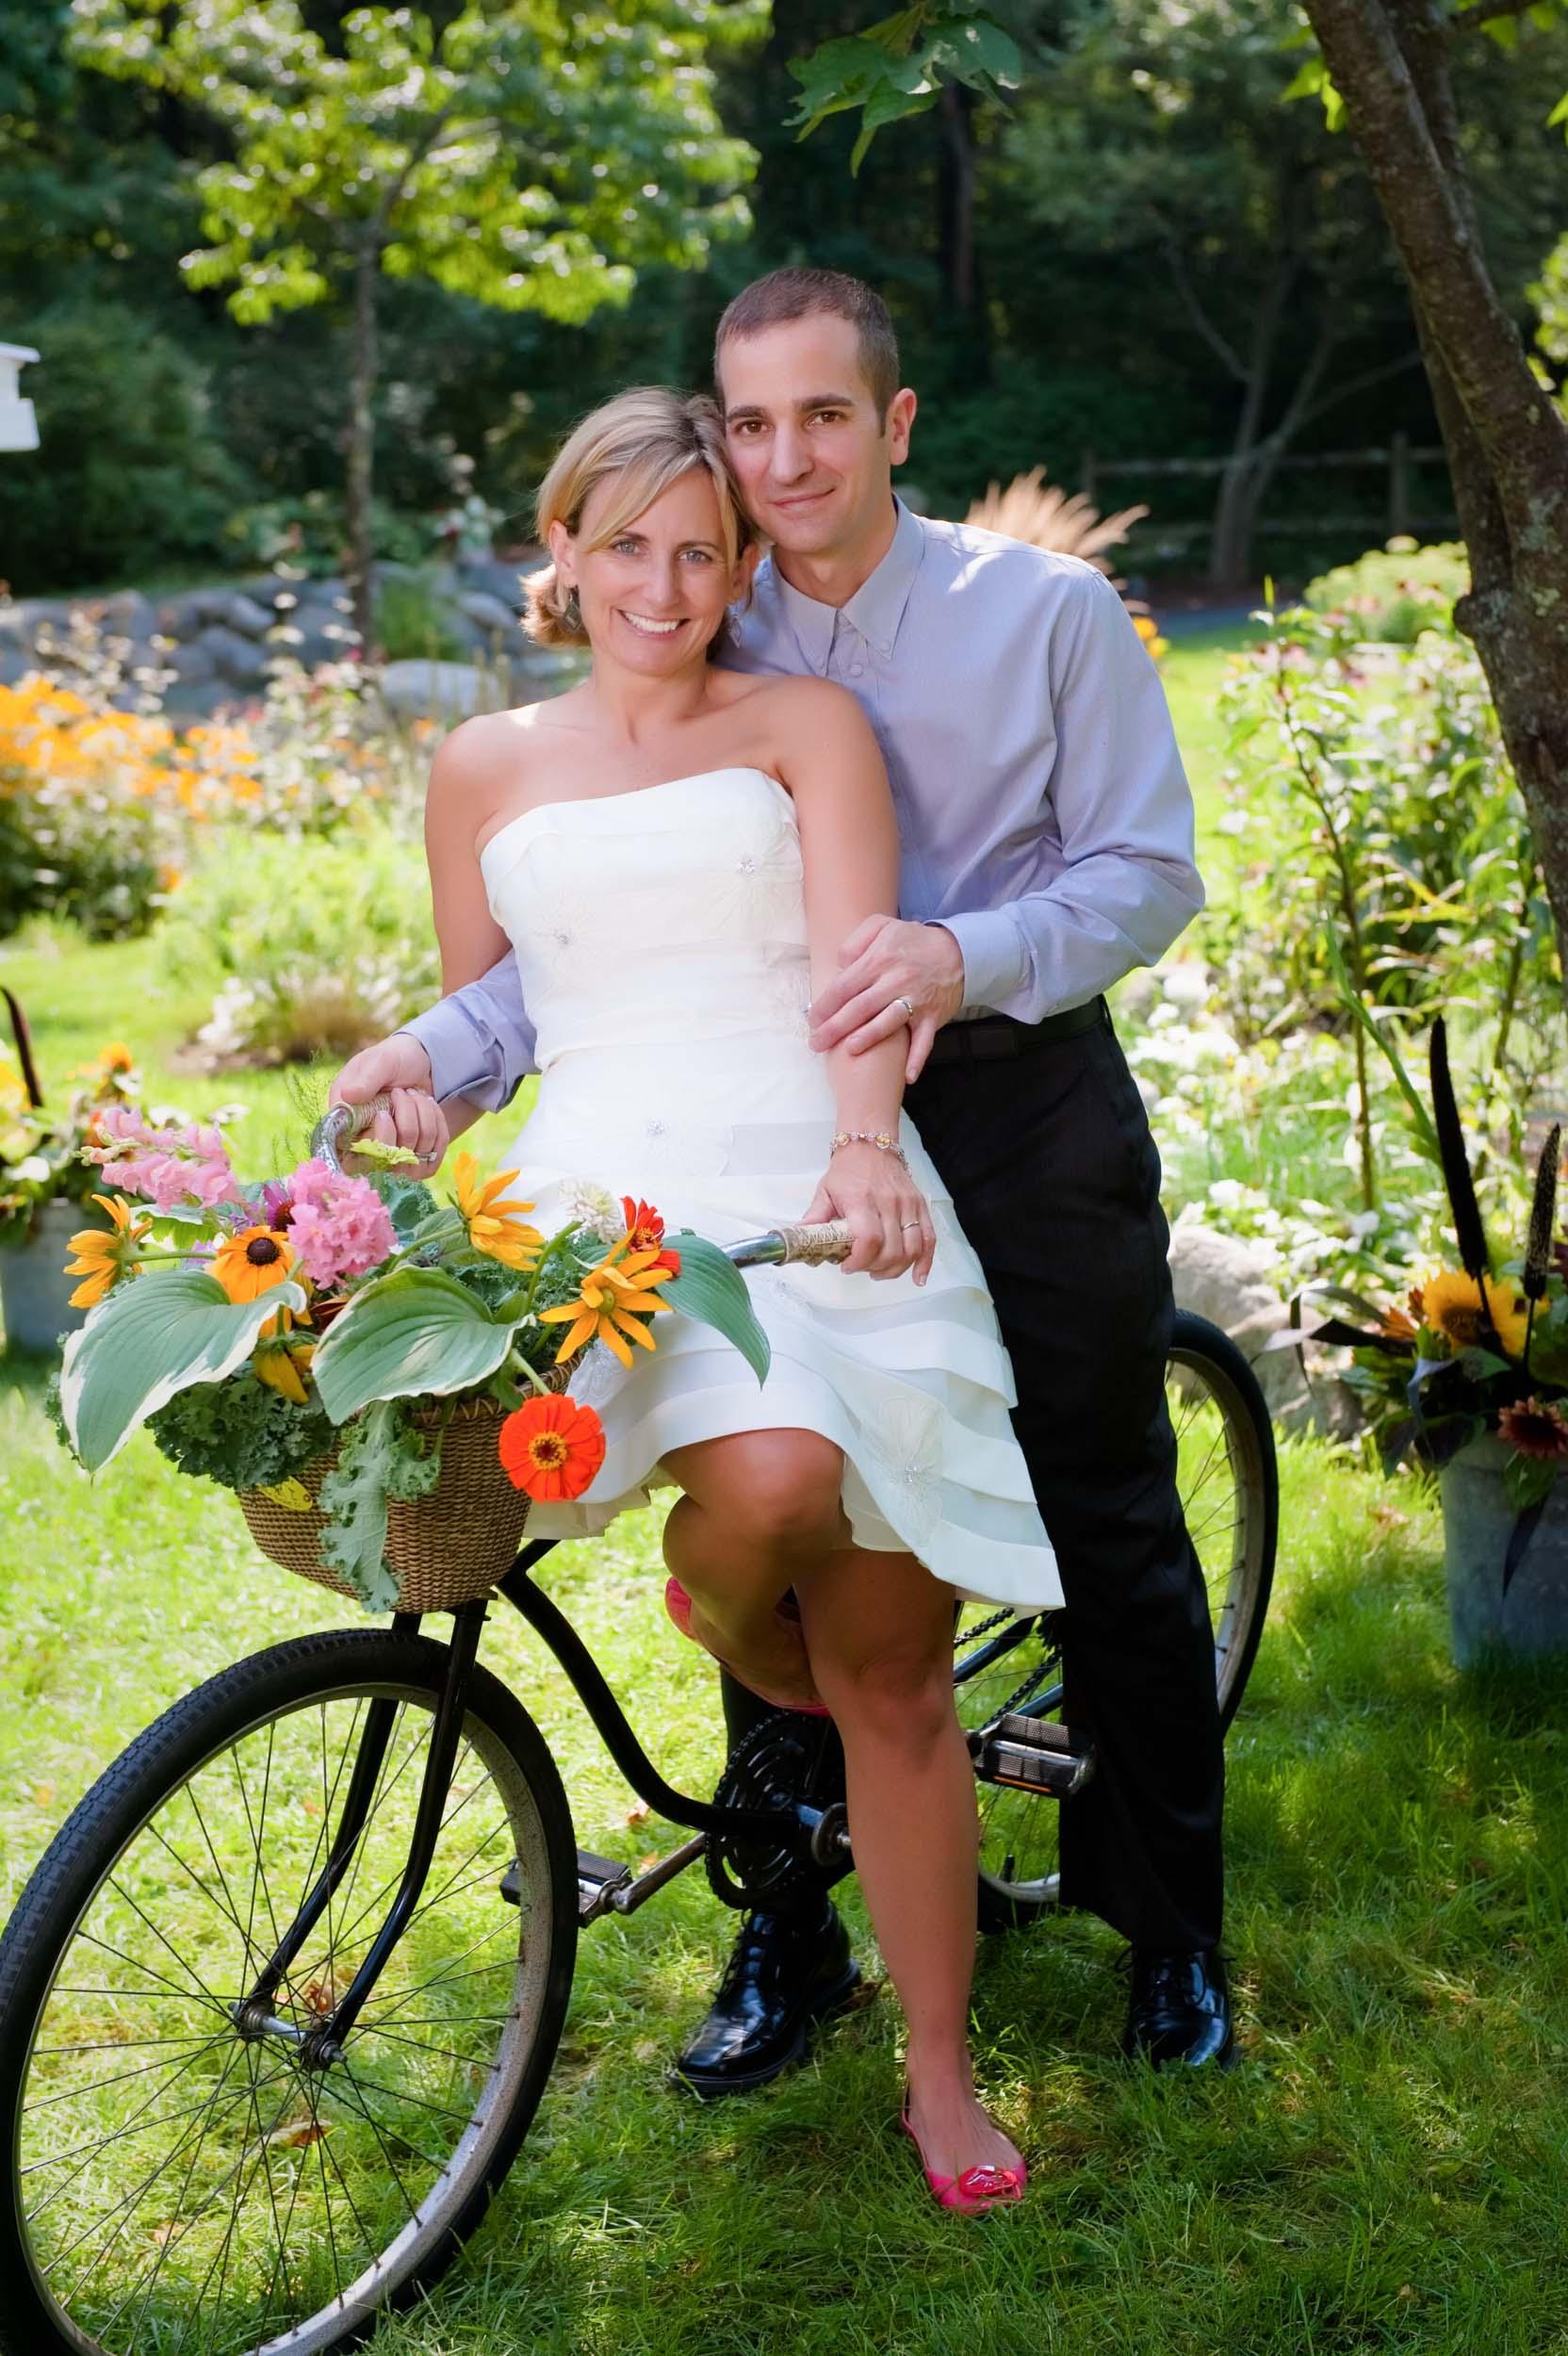 Wedding27_DSC6499-Edit-2.jpg